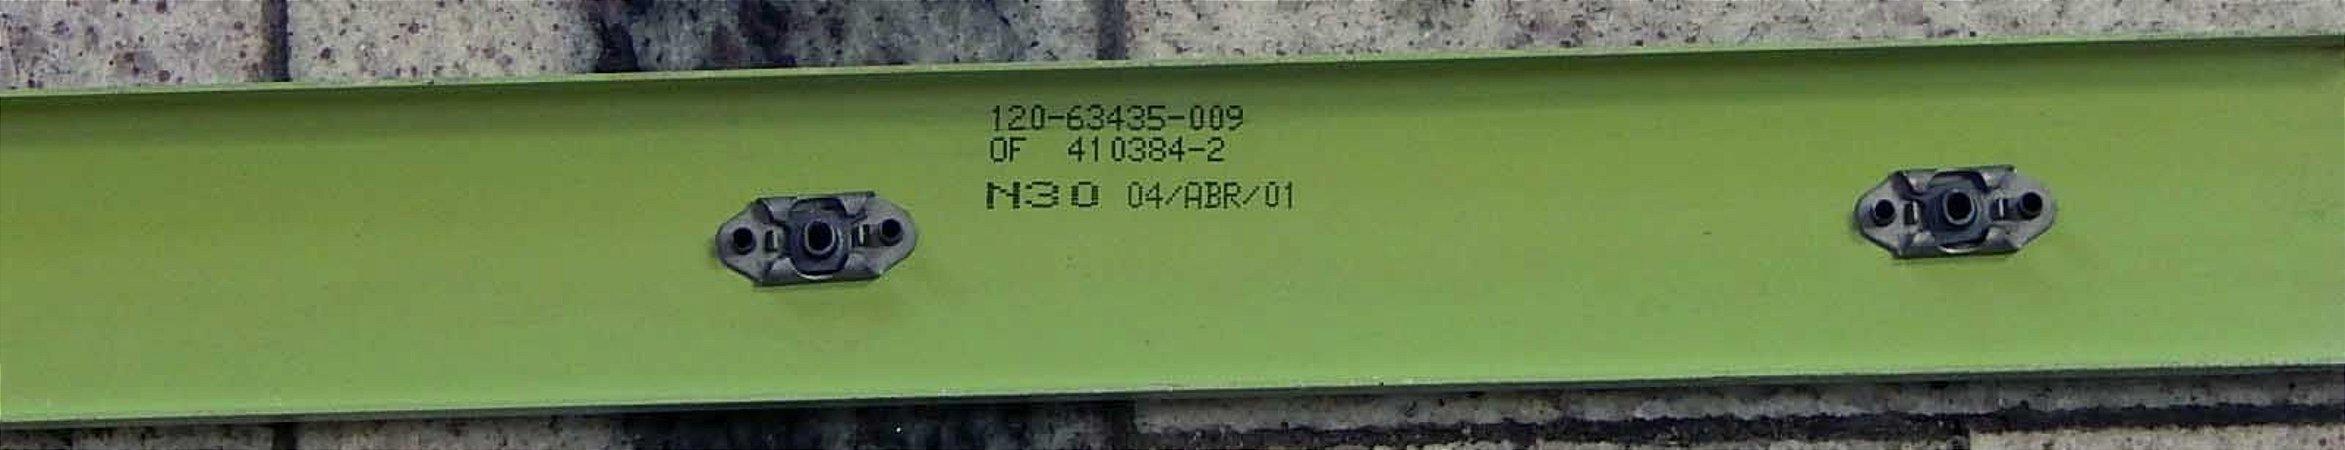 120-63435-009